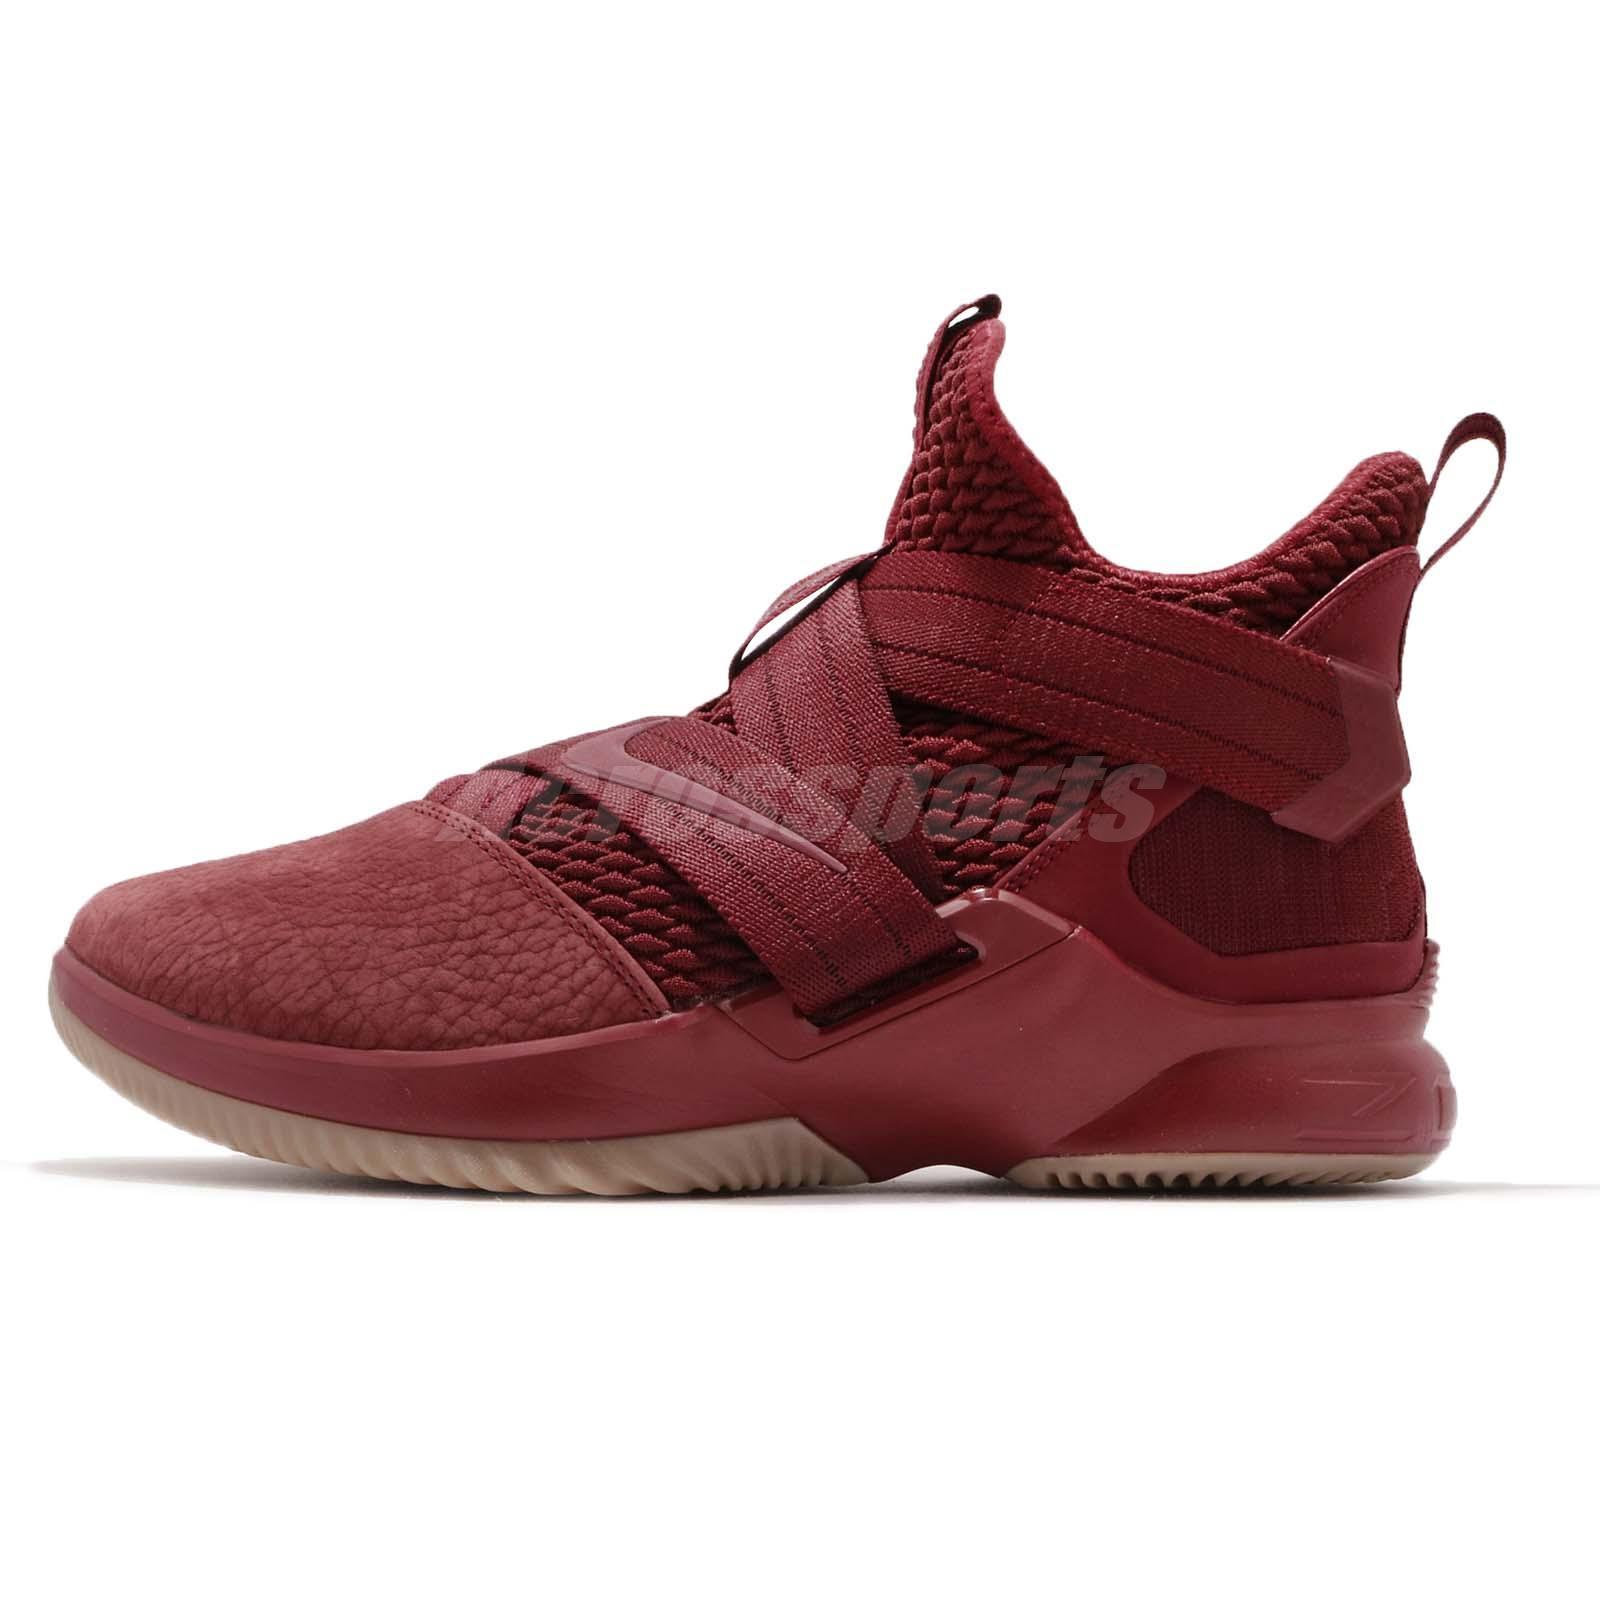 5e85e895bd2 Nike LeBron Soldier XII 12 SFG EP James Team Red Basketball Shoes AO4055-600